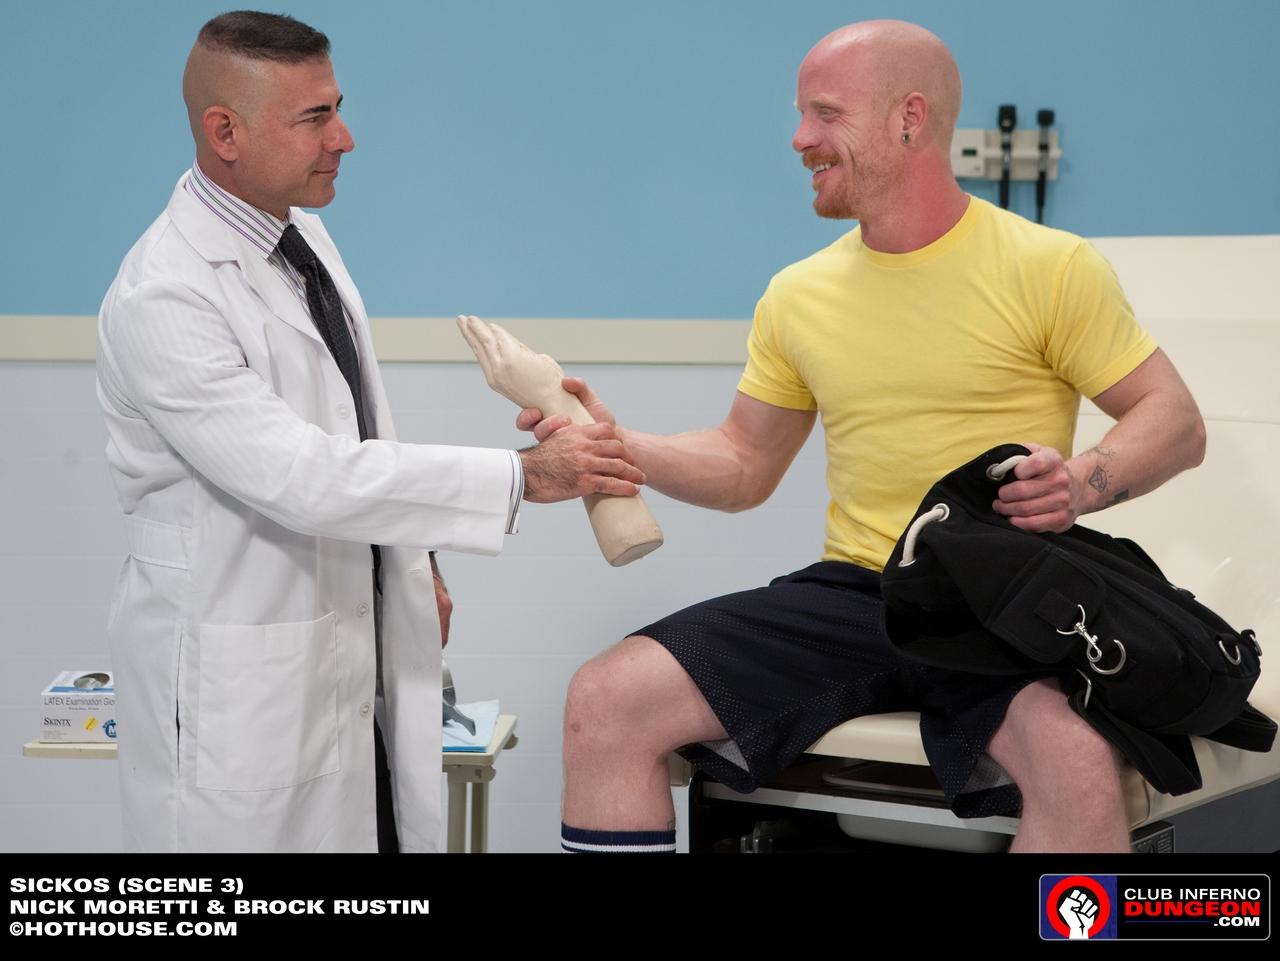 Dildo doctor video